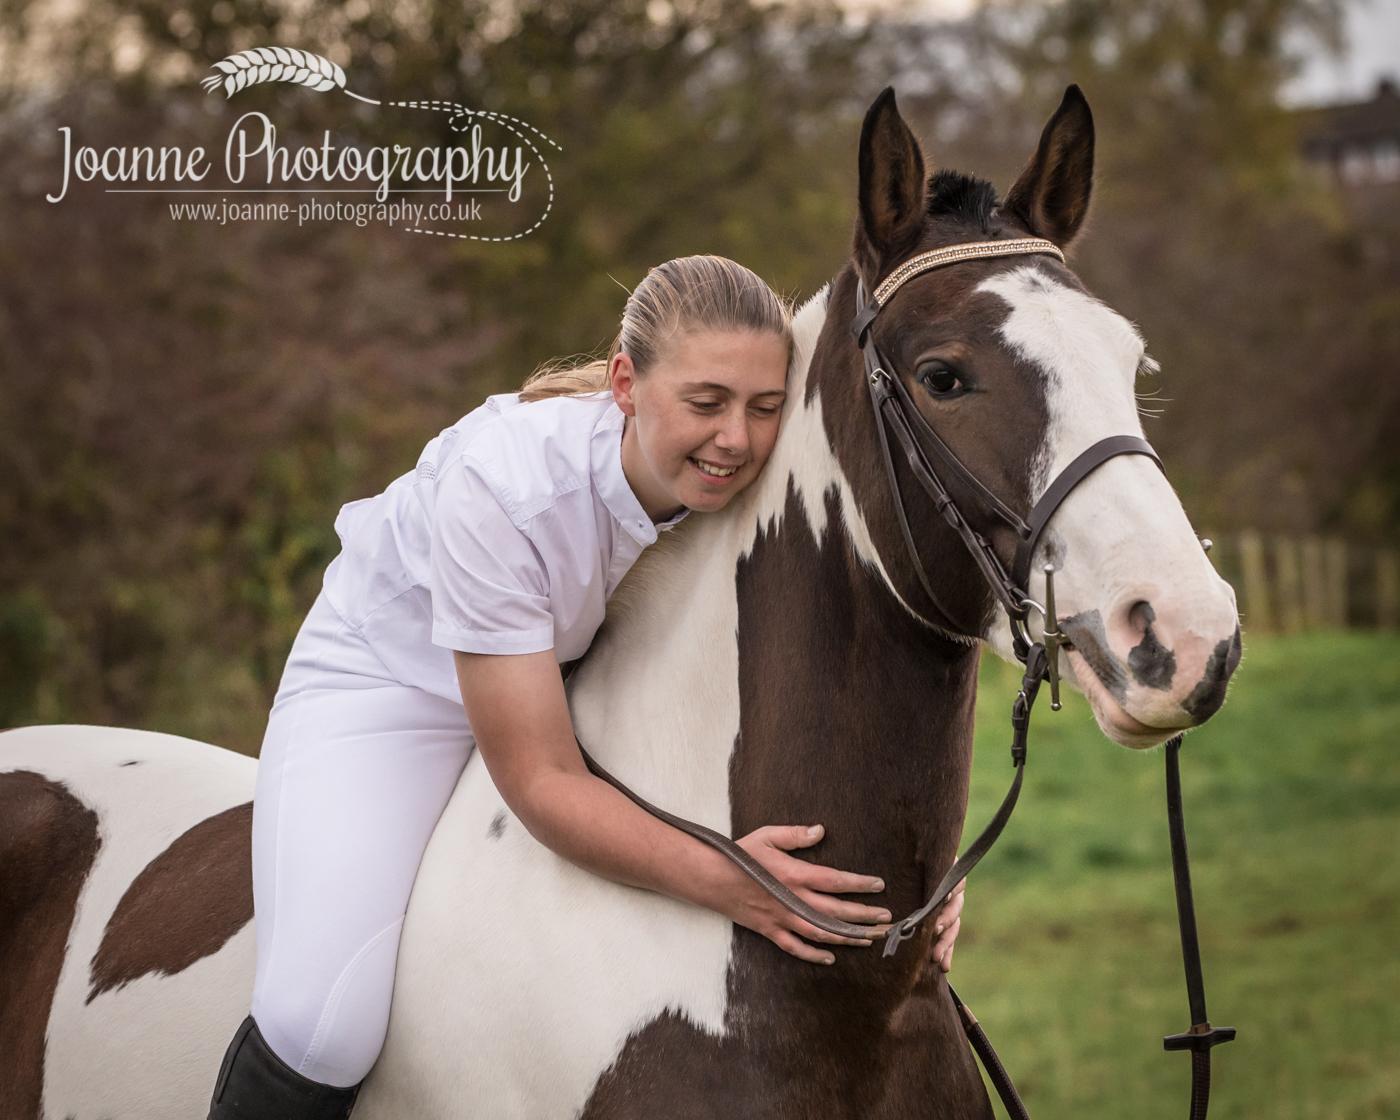 Equestrian Photoshoot Cheshire